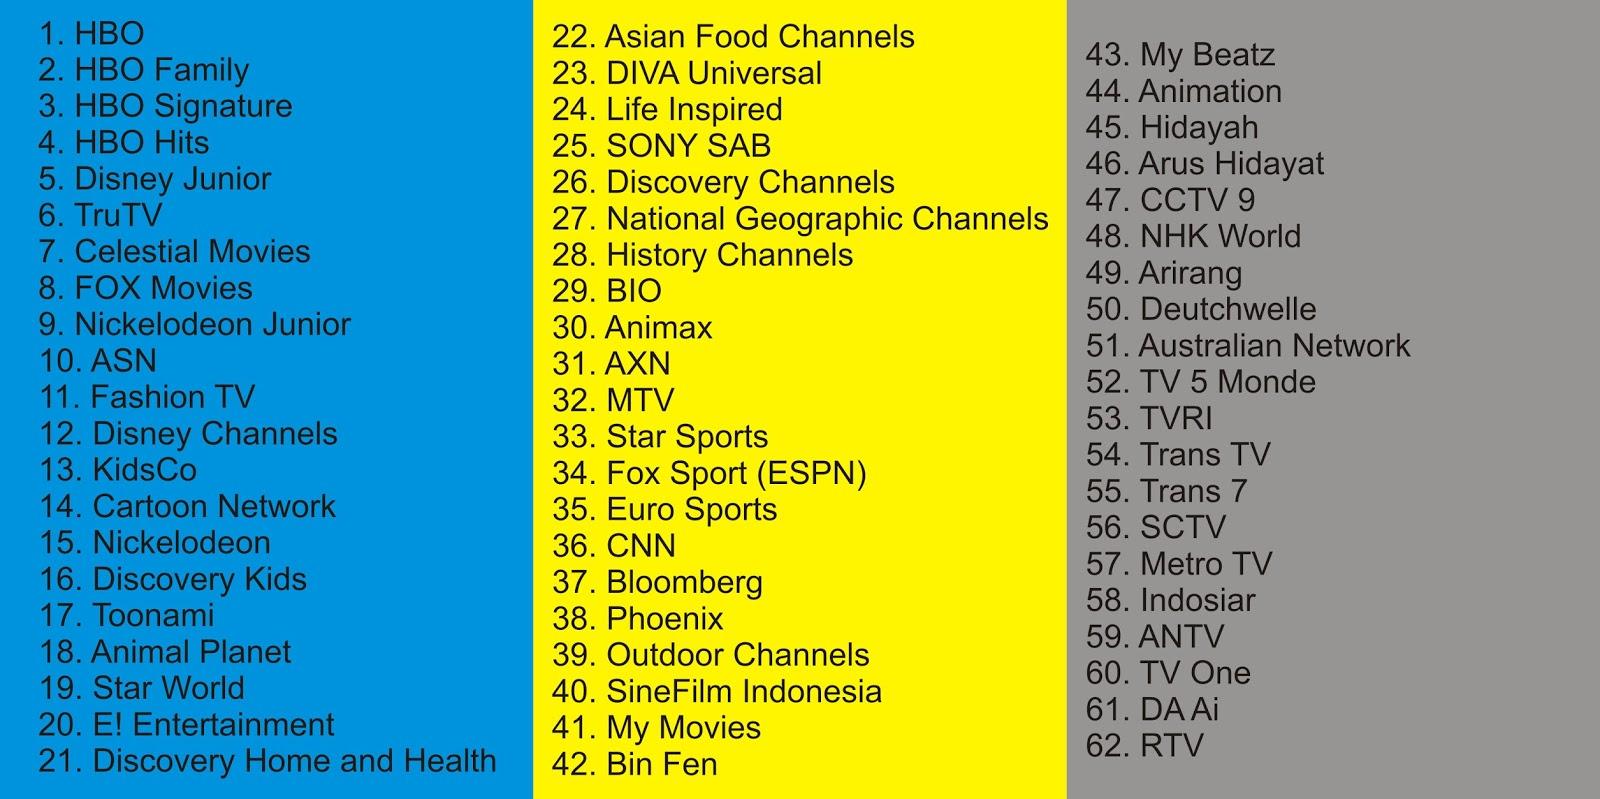 Parabola Mini Ninmedia Cirebon Jaring Topas Tv Prepaid Voucher Topastv Paket Basic 1 Tahun Berikut Daftar Channel Yang Bisa Terbuka Secara Gratis Selama 24 Bulan